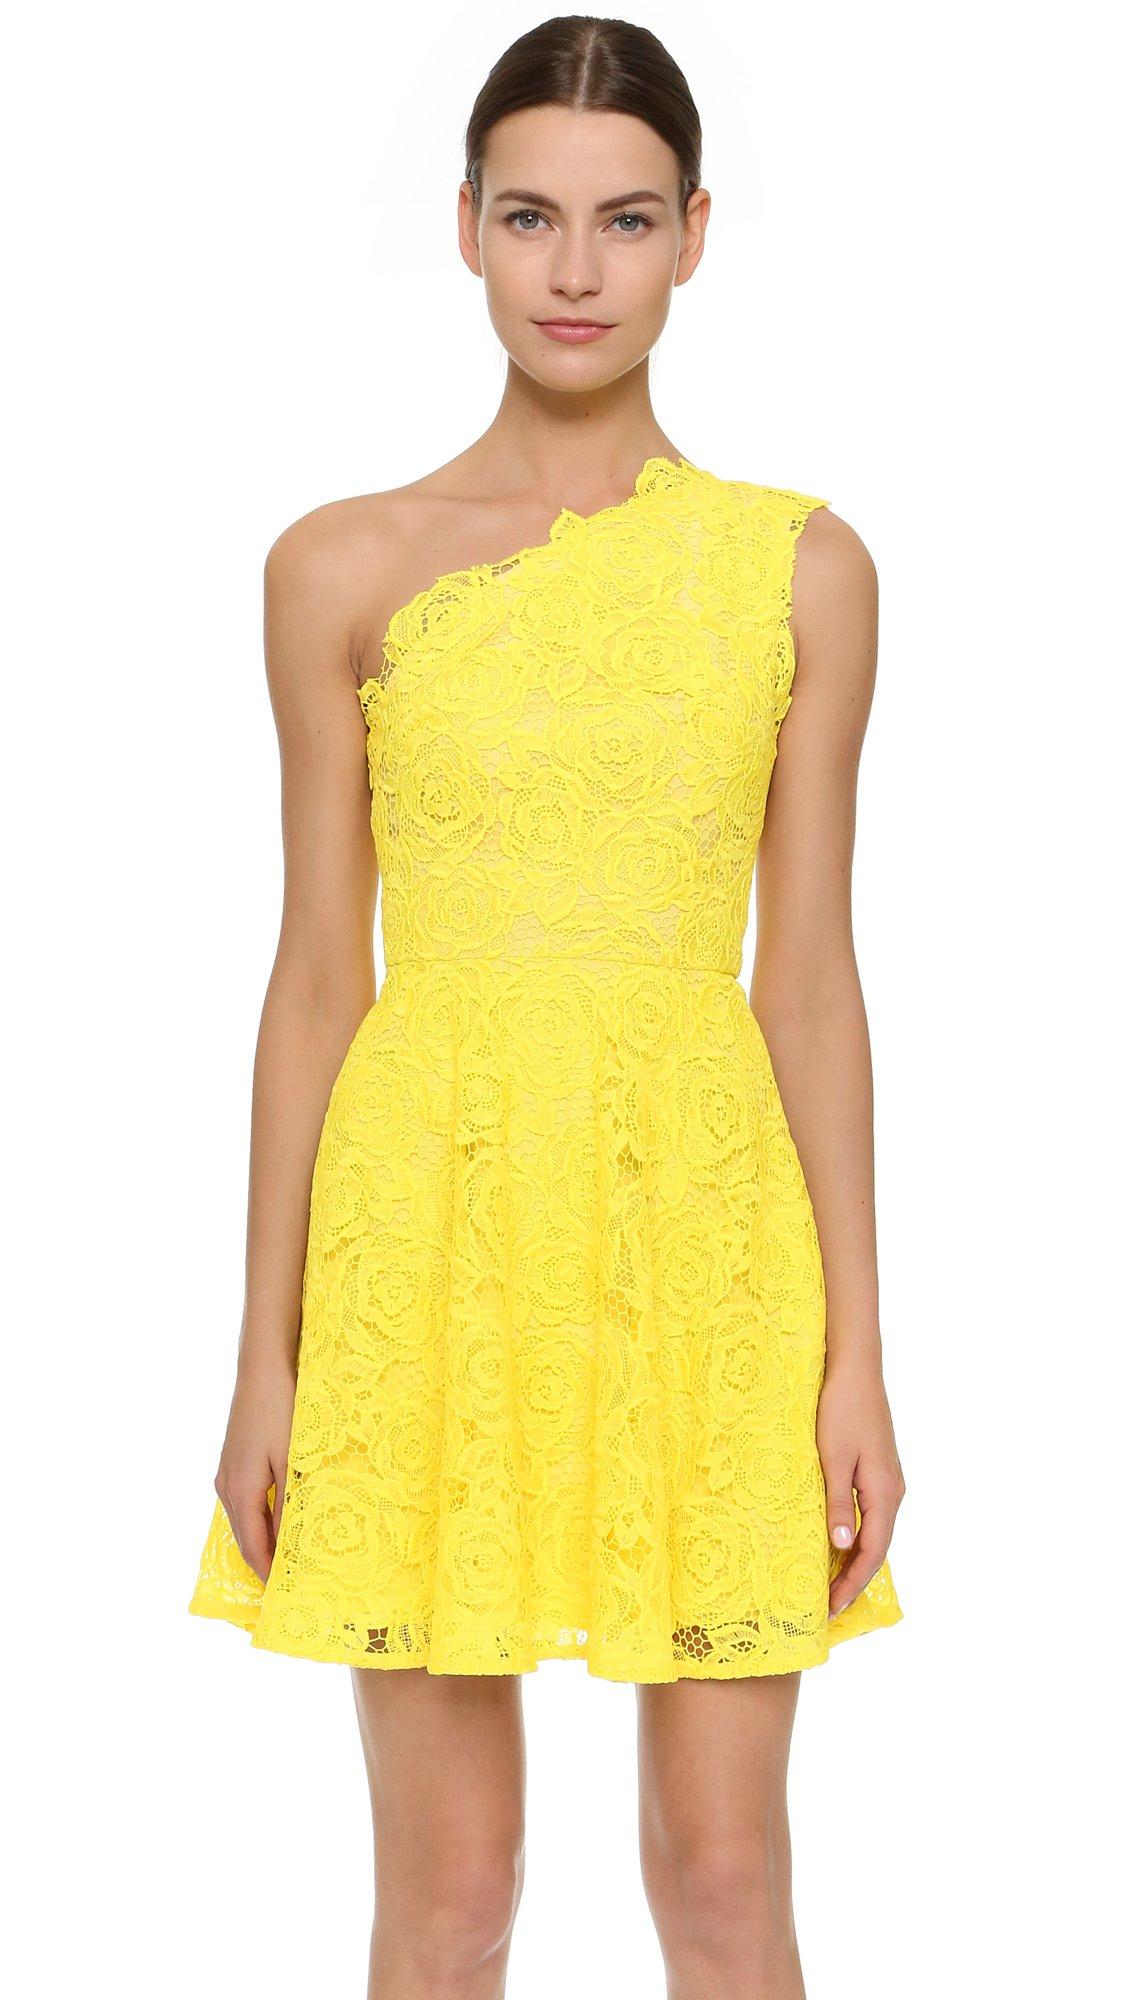 Lemon yellow cocktail dress